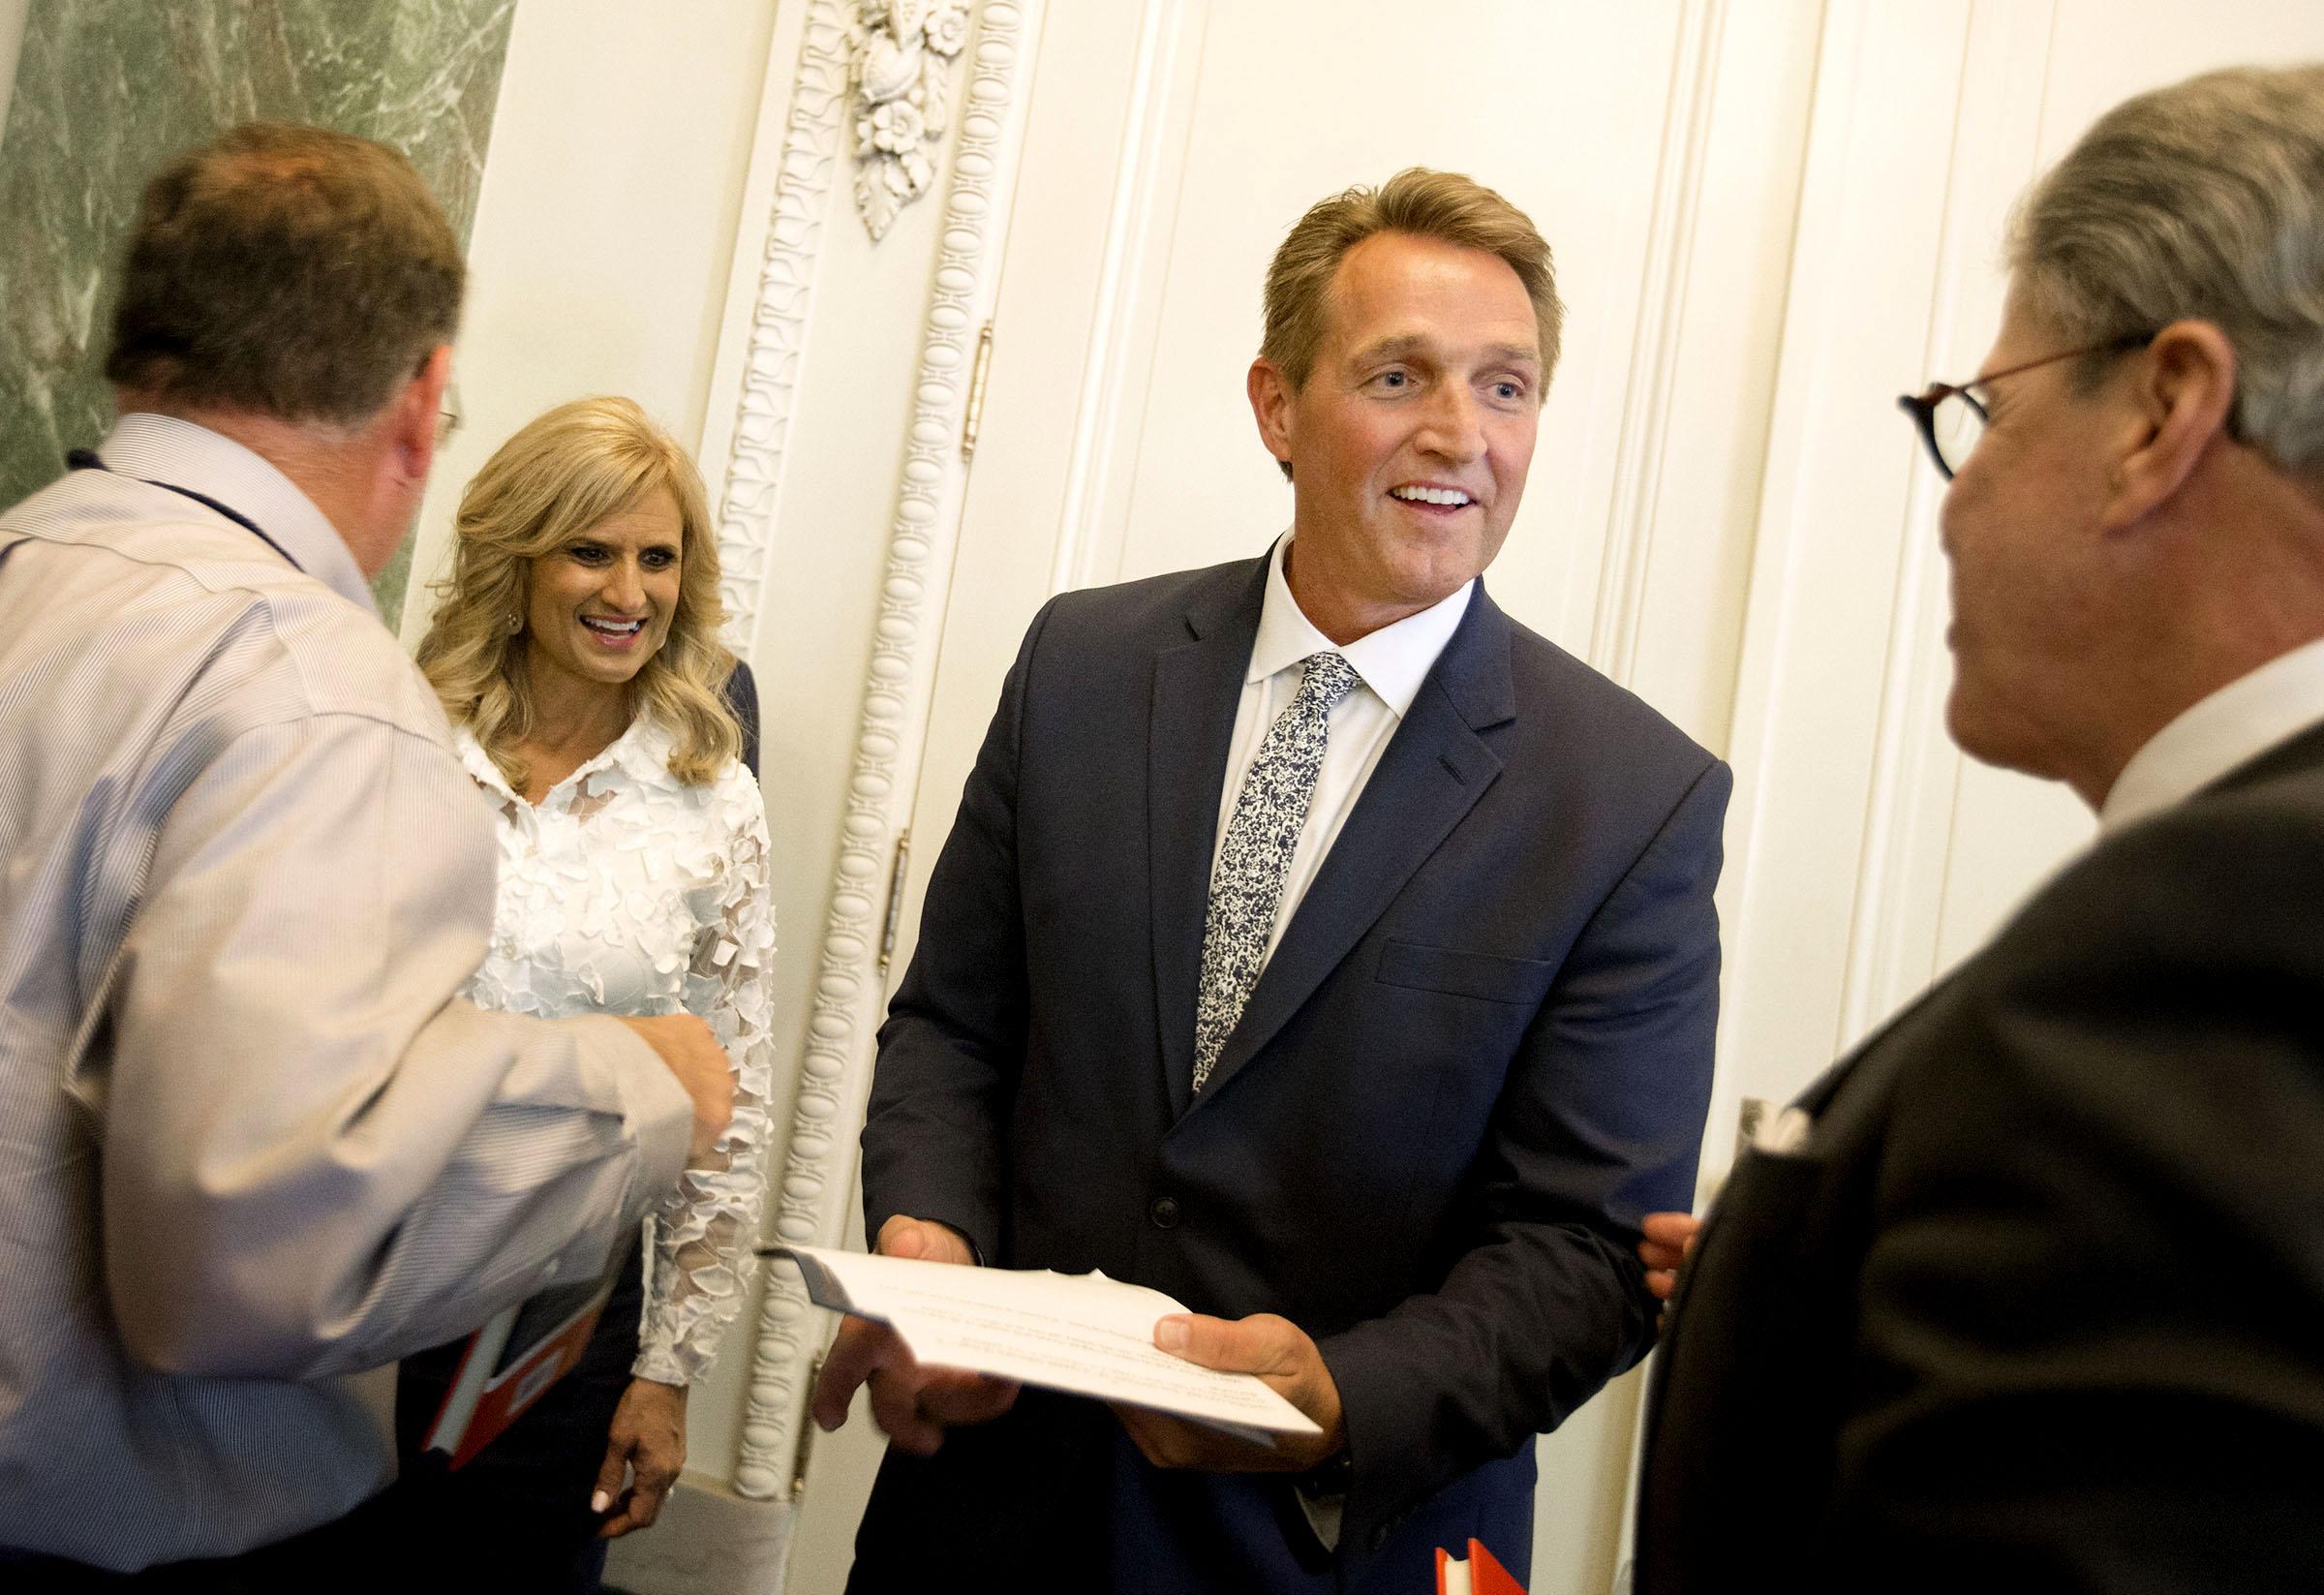 Cheryl Flake, left, and her husband, Sen. Jeff Flake, R-Ariz., speak with friends in Salt Lake City.